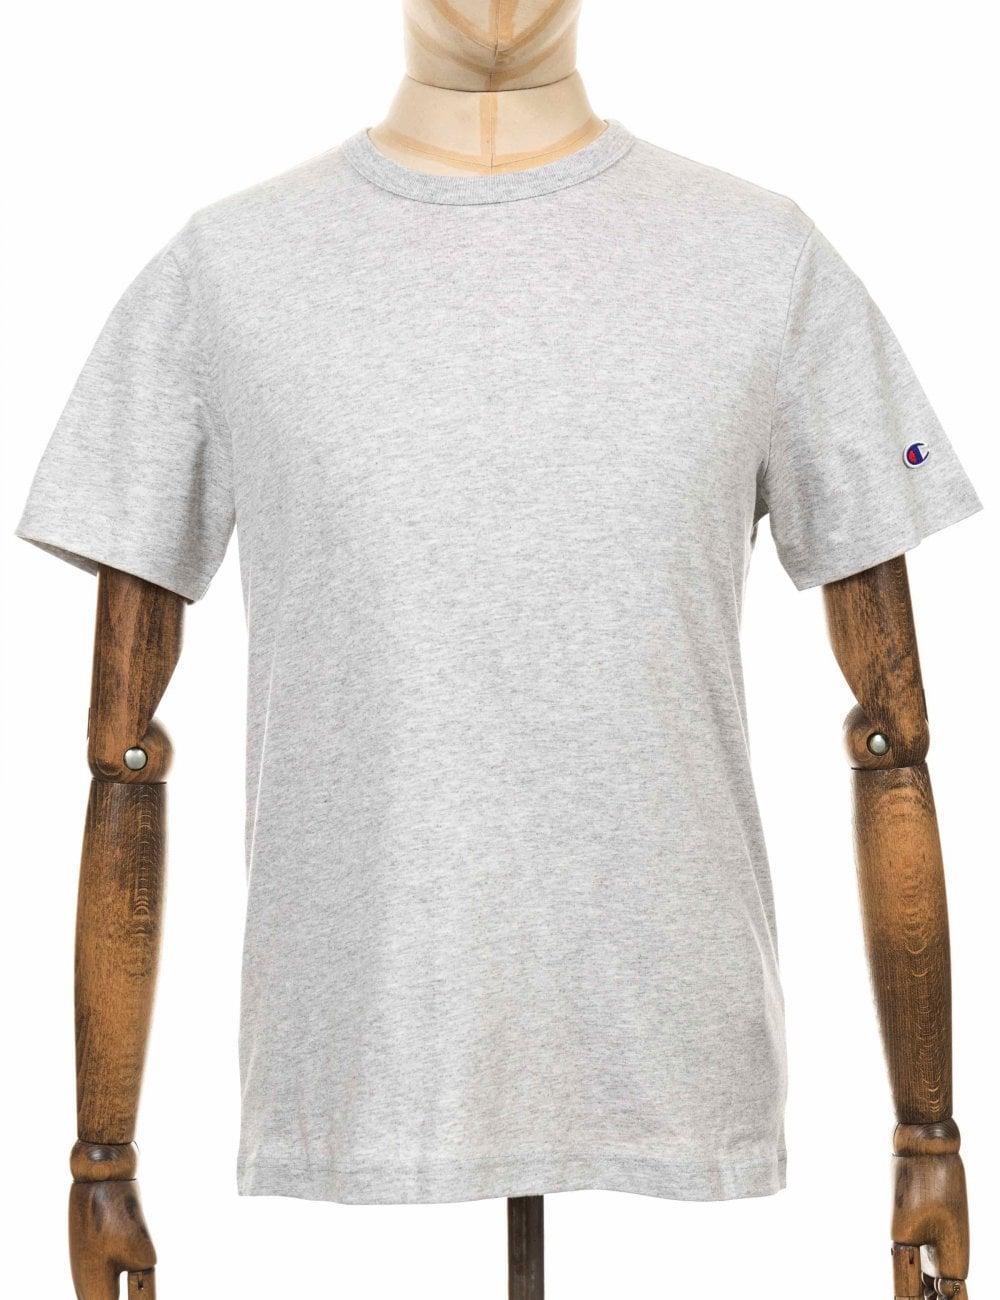 0154ea6dc Champion Reverse Weave Crewneck Tee - LOXGM Light Grey - Clothing ...